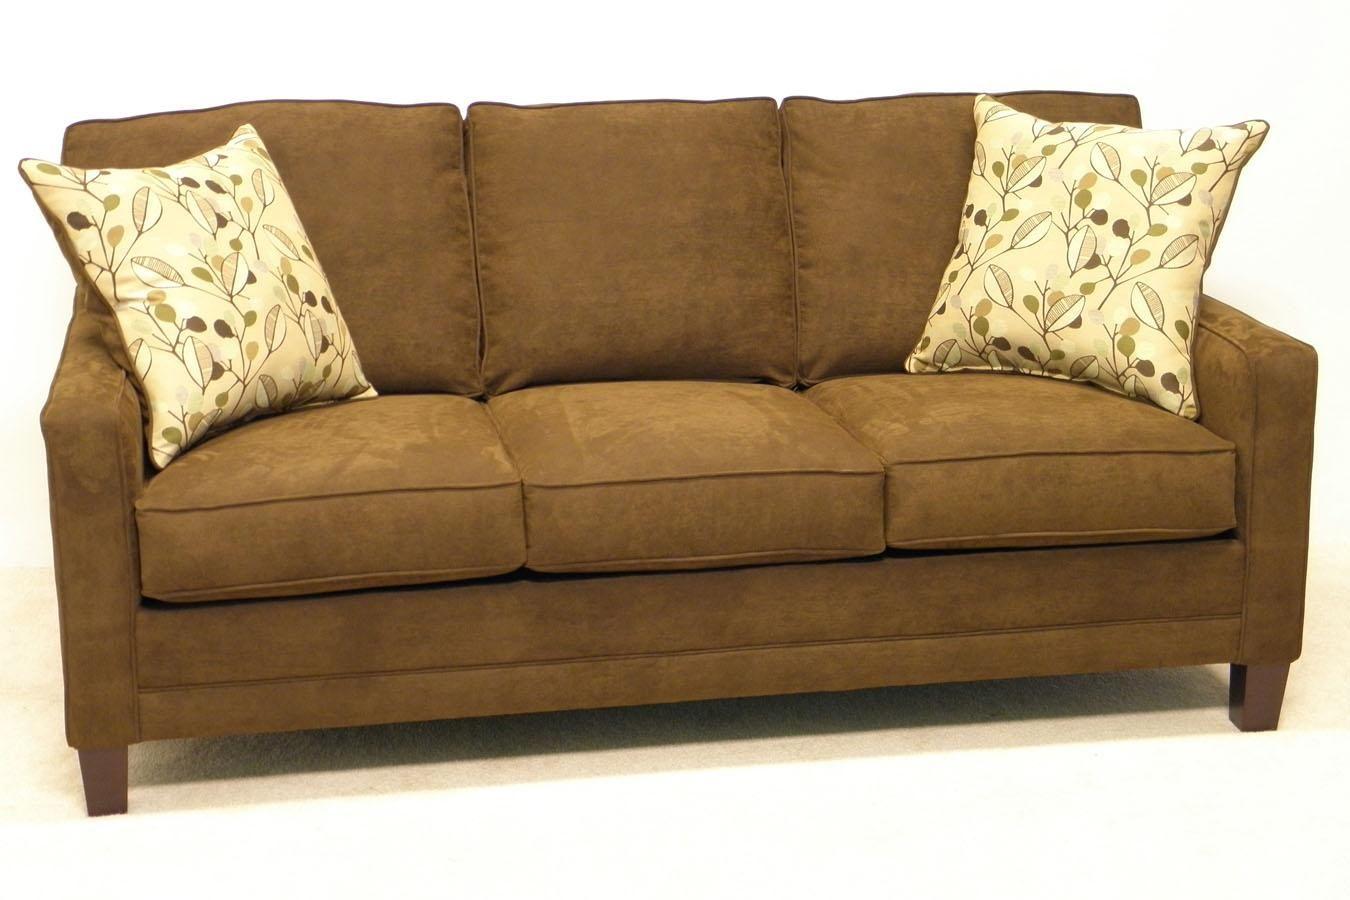 665 Queen Sofa Sleeper By Lacrosse New Sleeper Sofas